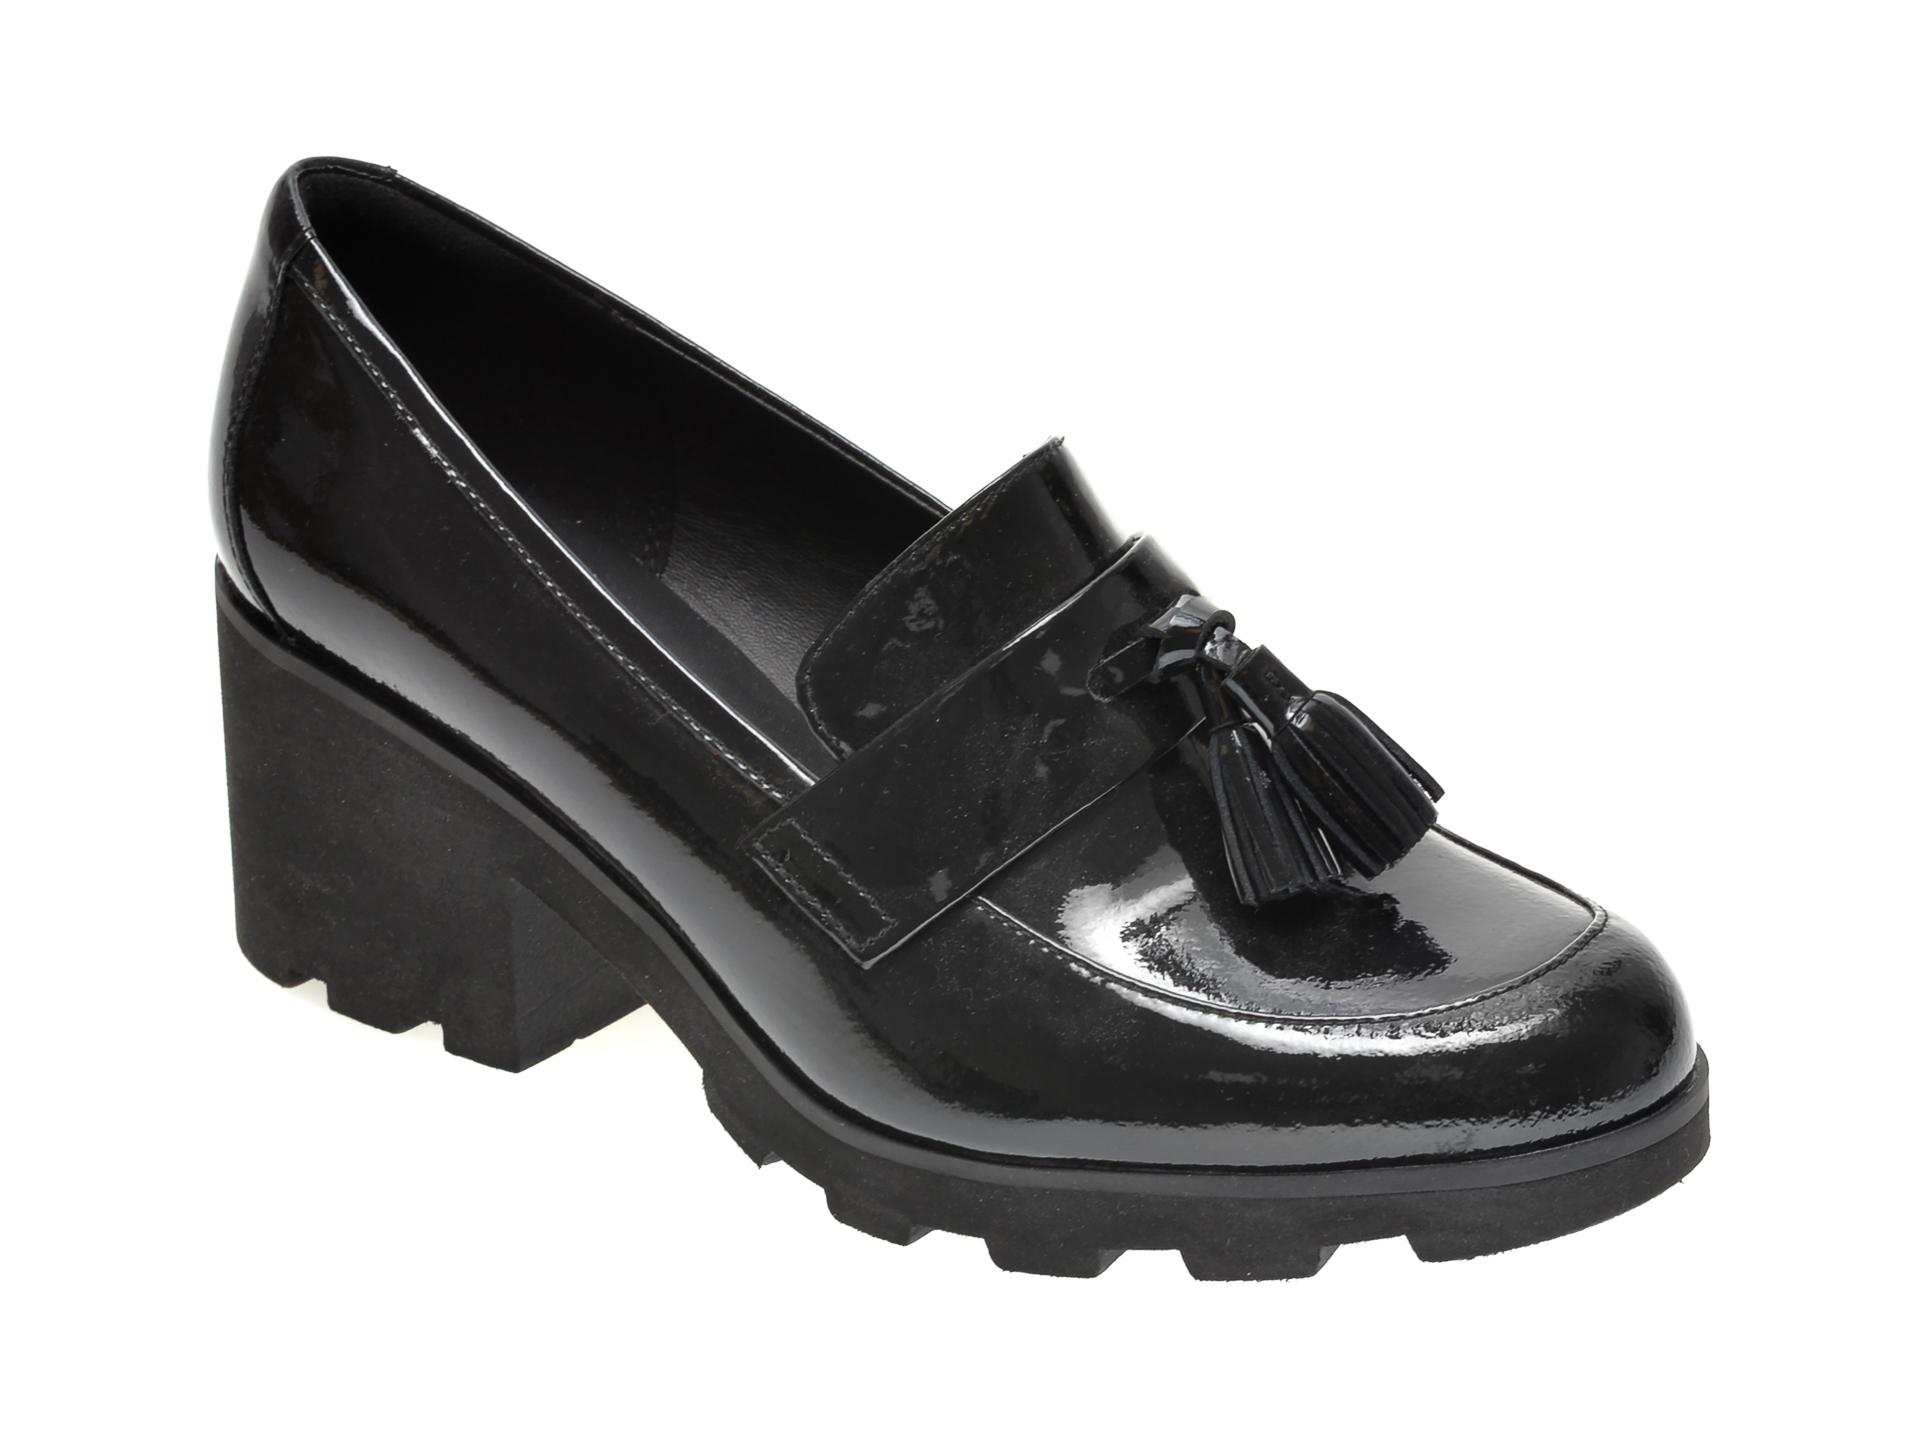 Pantofi CLARKS negri, RENE LOAFER, din piele naturala lacuita imagine